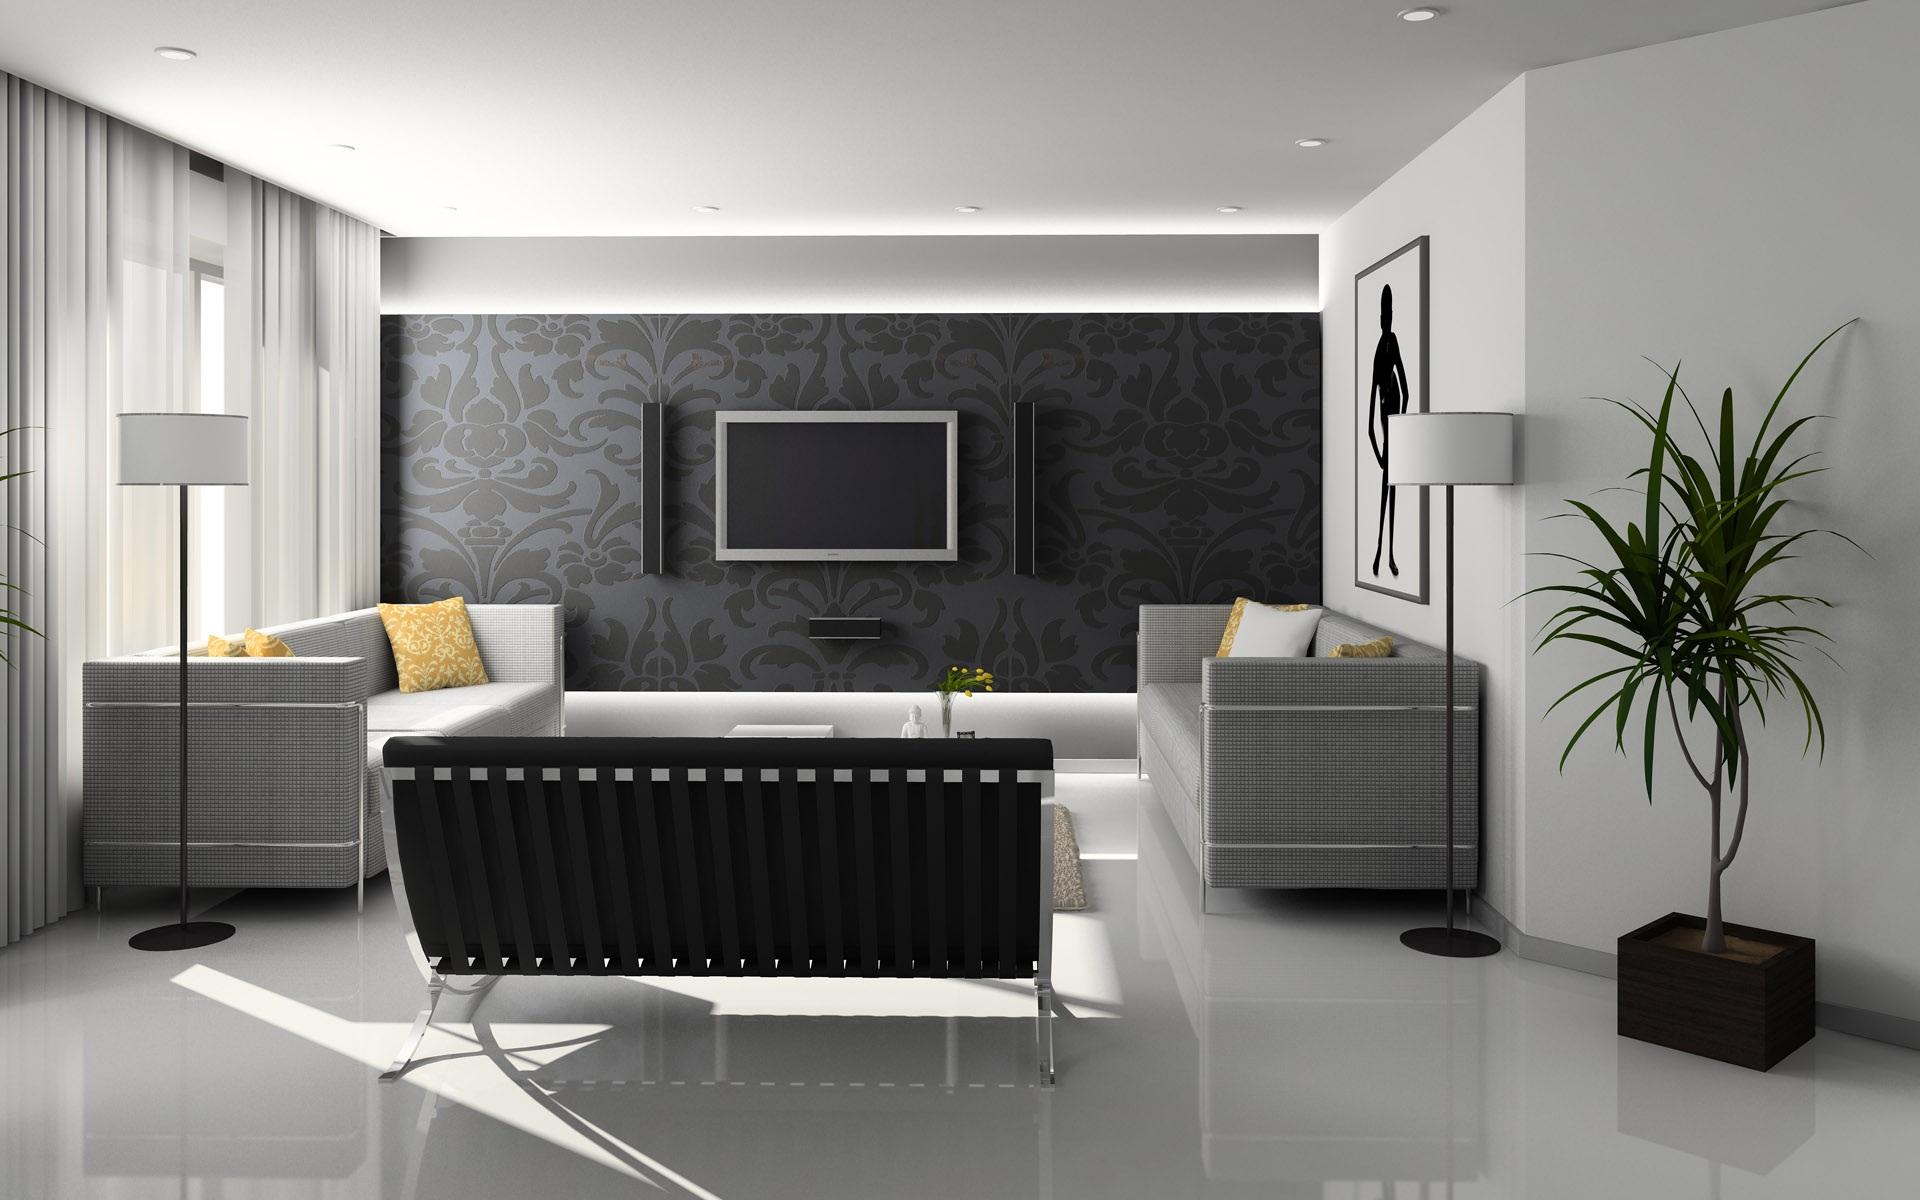 1000+ Engaging Interior Design Photos · Pexels · Free Stock Photos